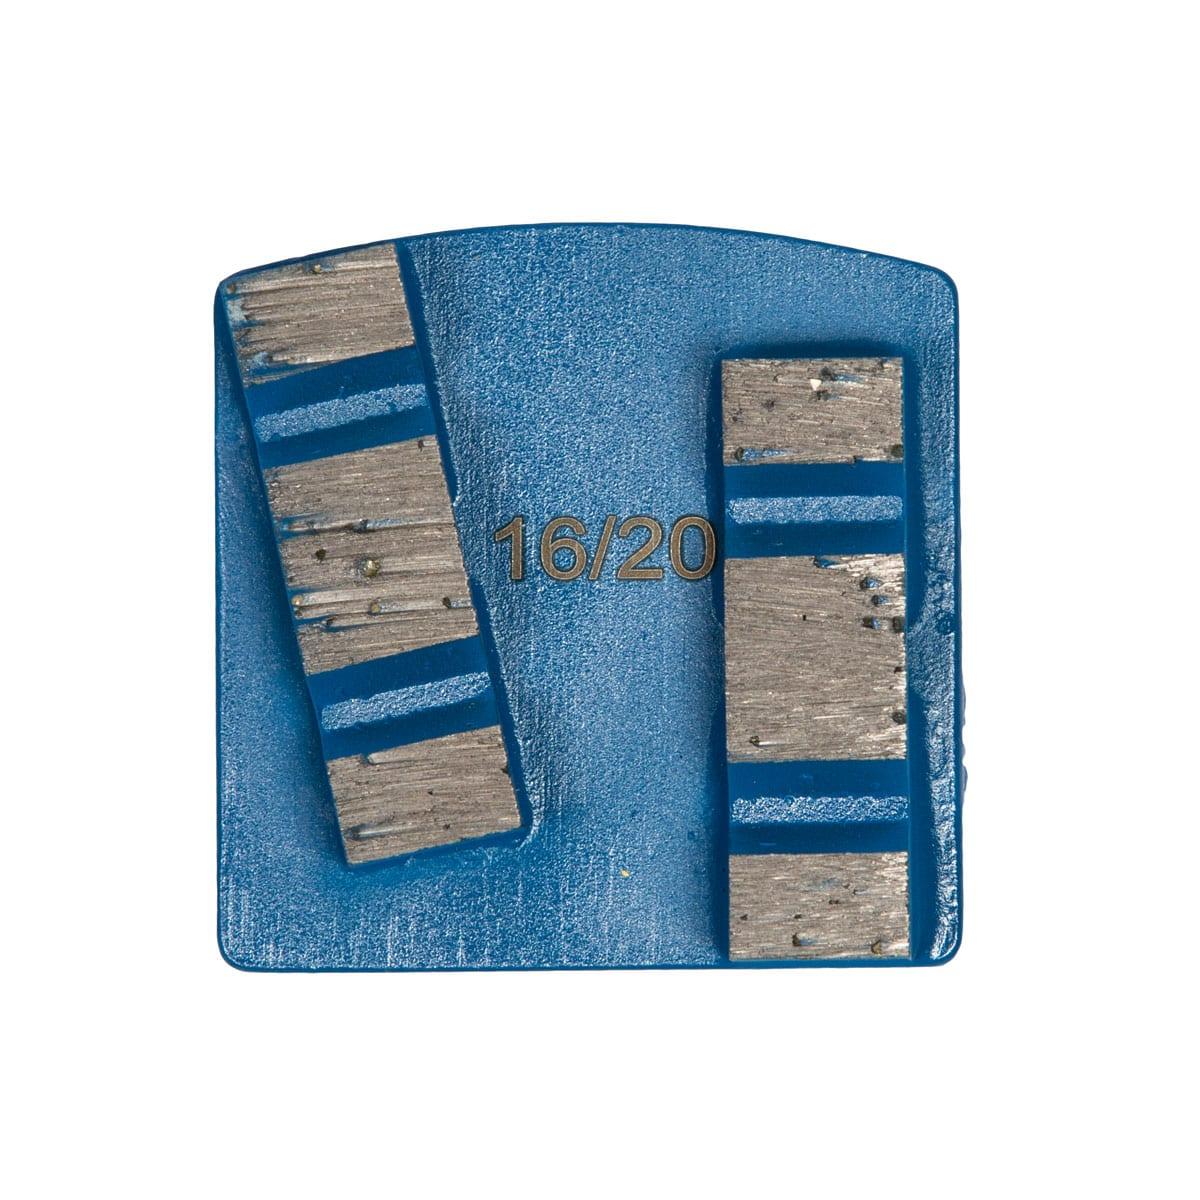 Front Medium Concrete Hardness 8 mm - 12mm Concrete Diamond Tool Blue Double #16/20 | #30/40 | #60/80 | #140/150 by Scanmaskin